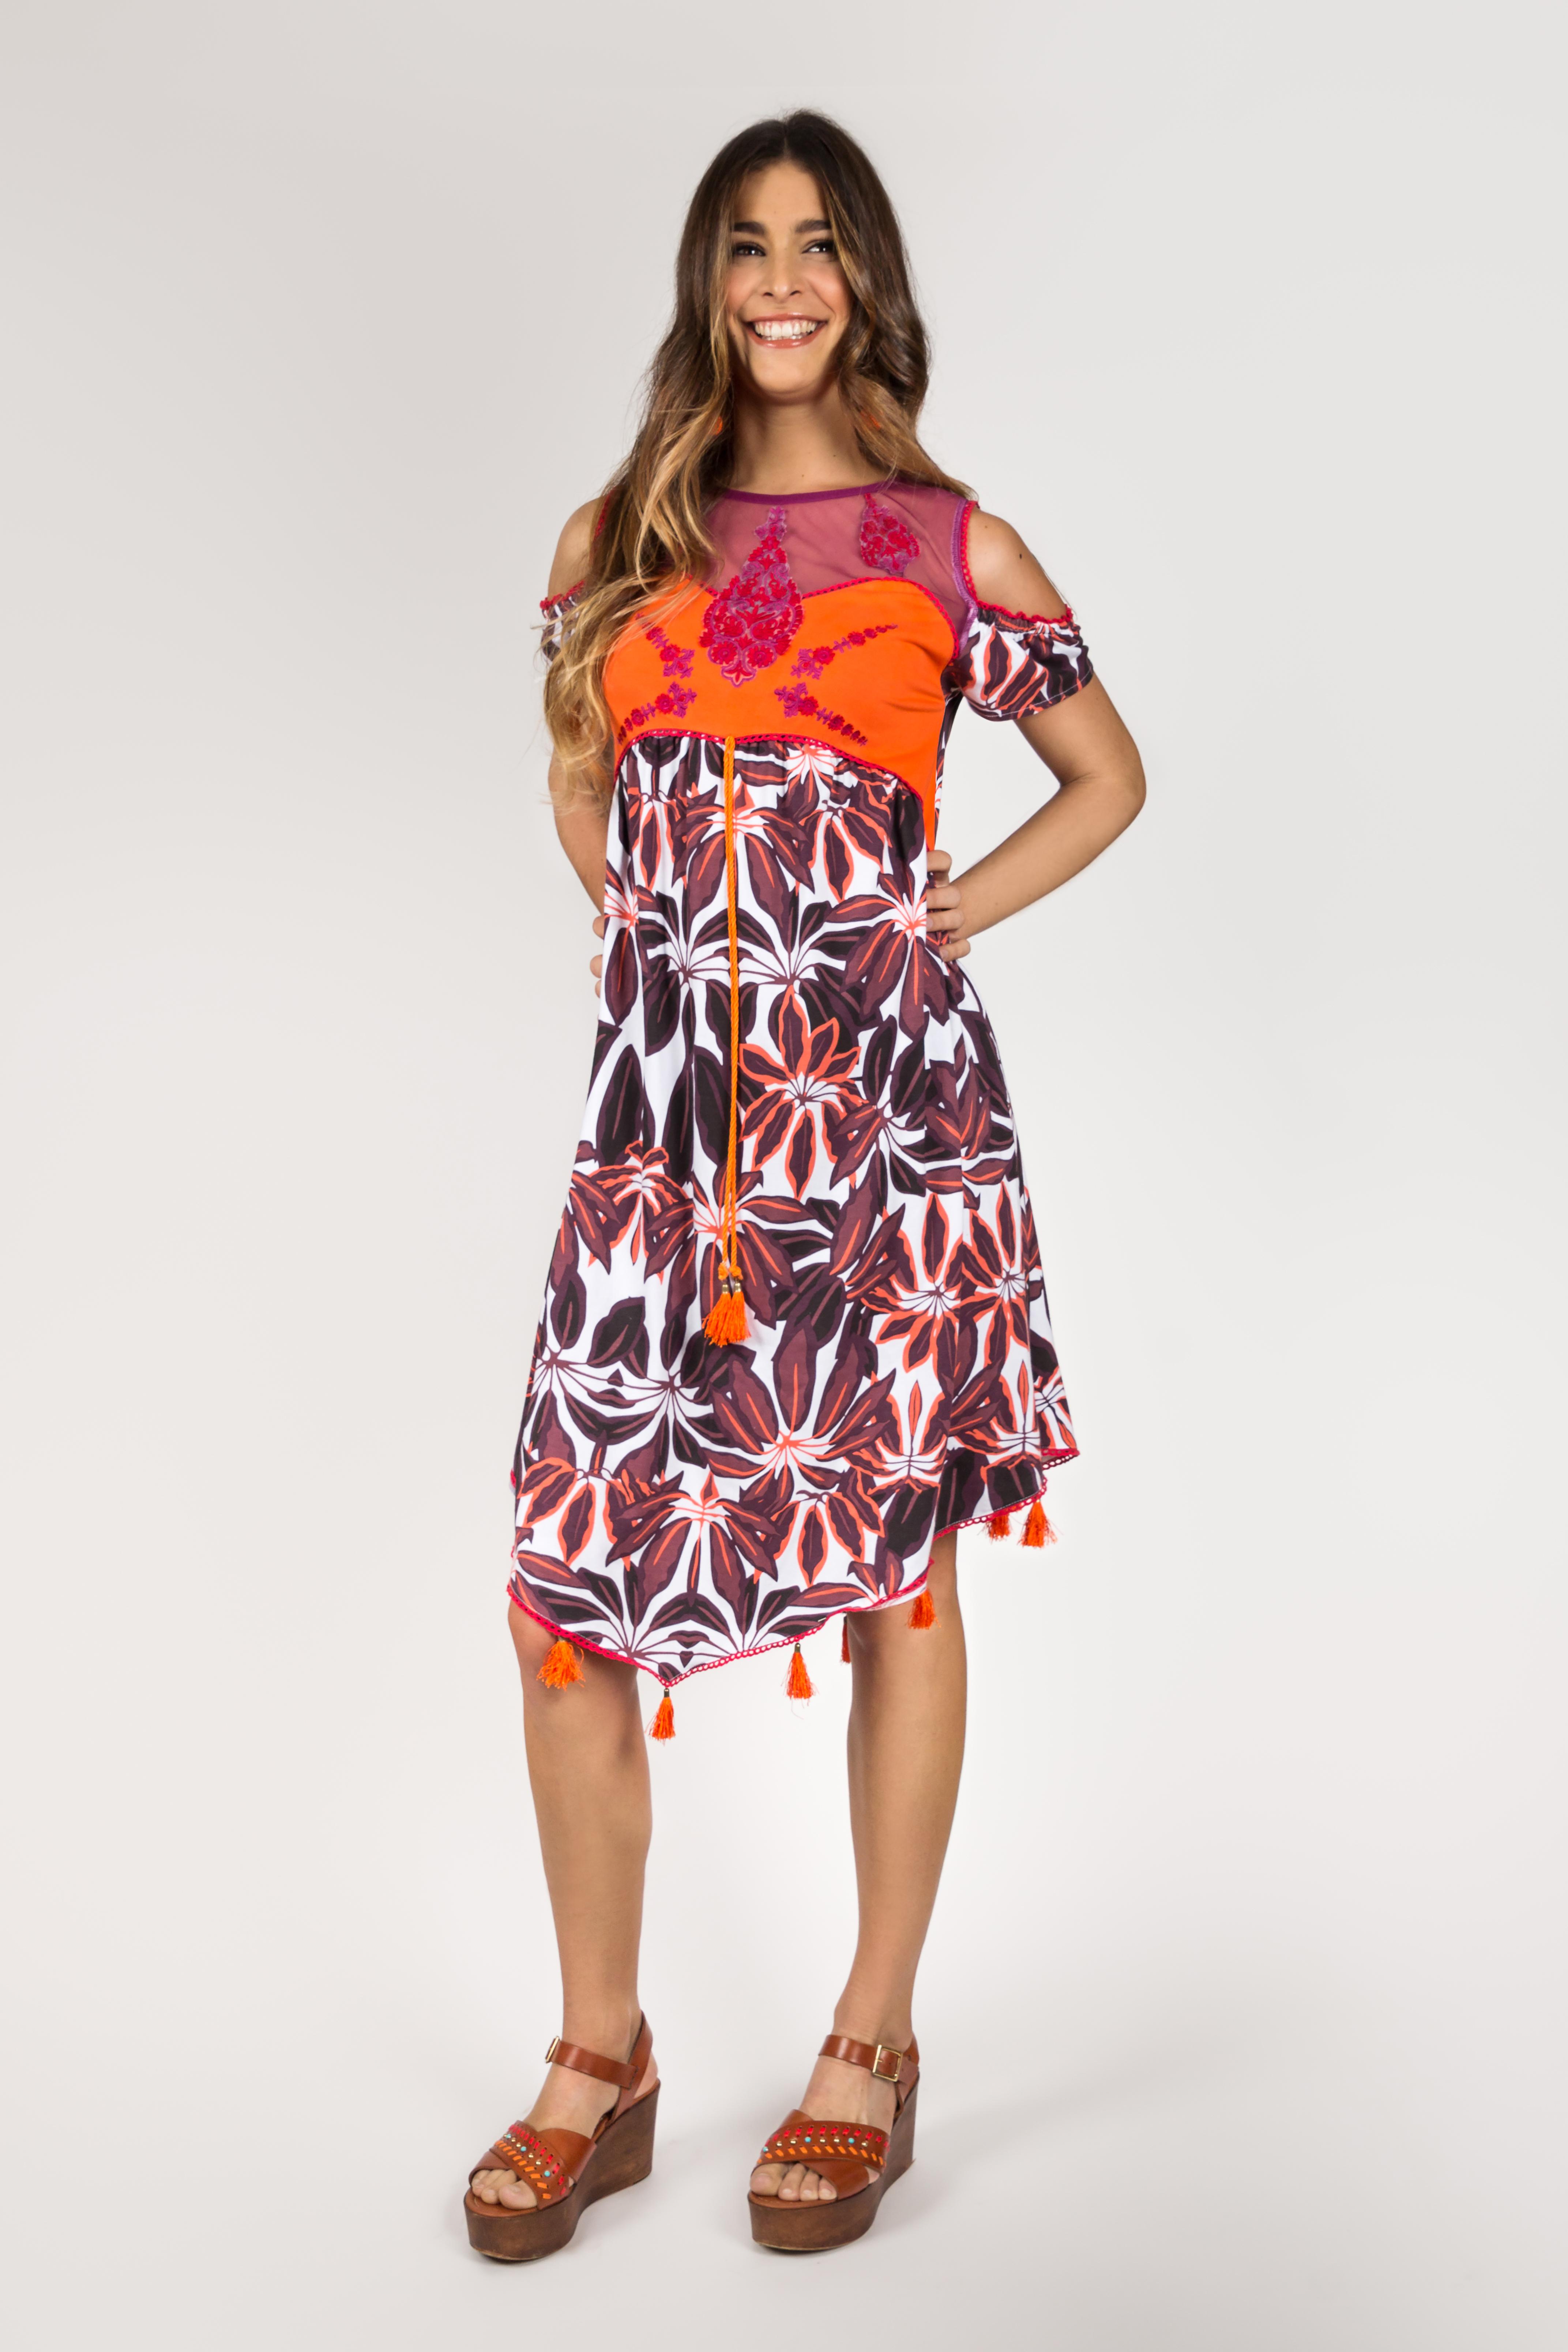 Shoklett Spain: Orange Hibiscus Cold Shoulder Samantha Midi Dress SHOKLETT_62S19DR_N